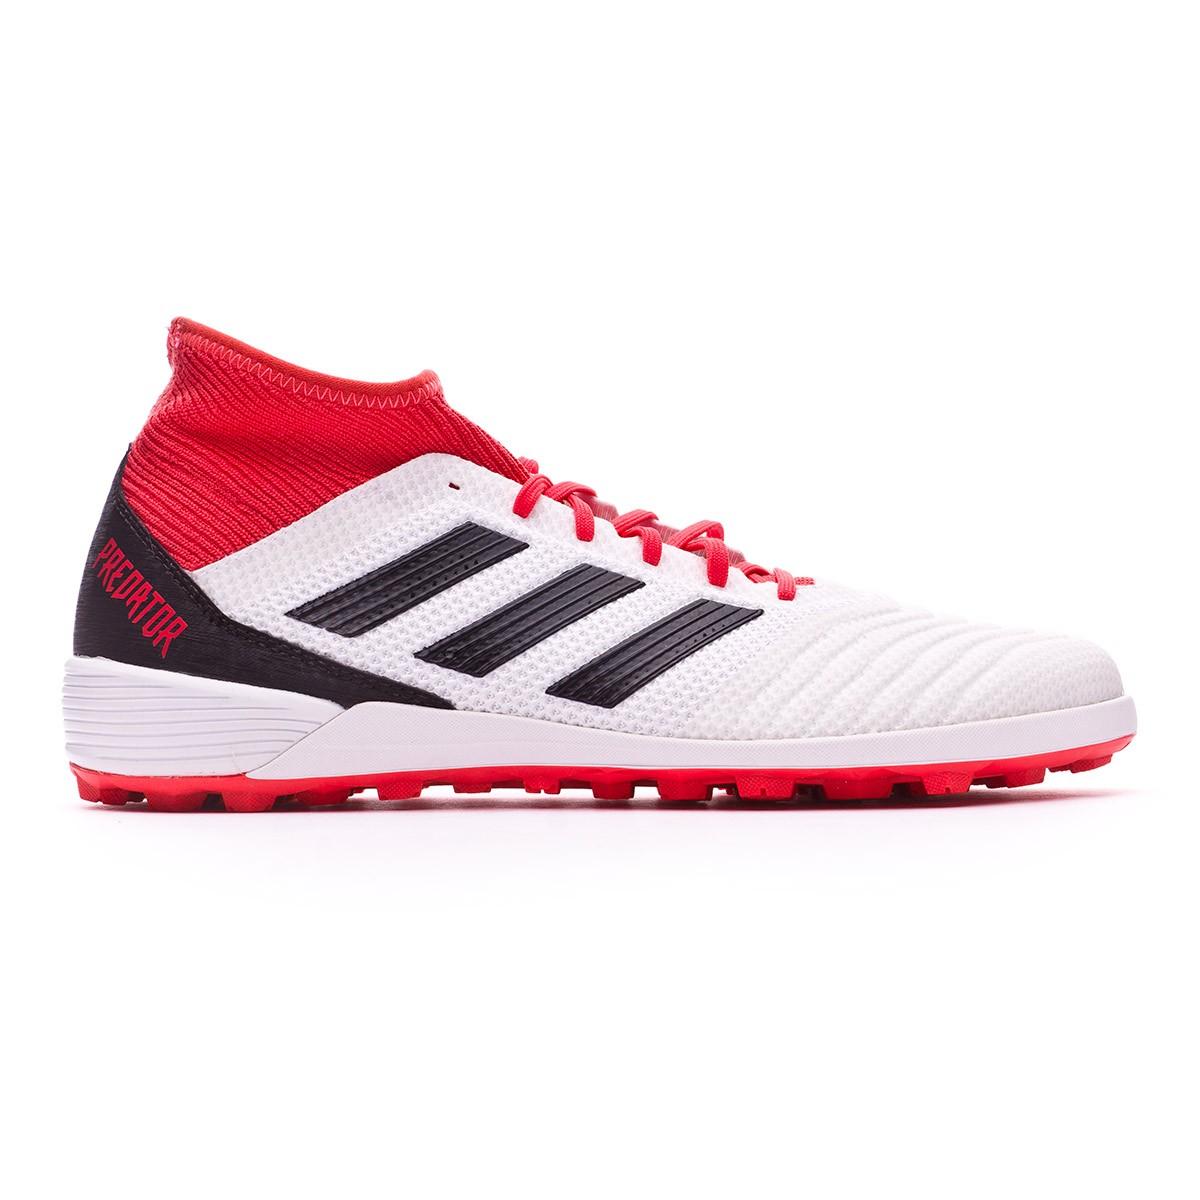 4f77ea73caf29 Tenis adidas Predator Tango 18.3 Turf White-Core black-Real coral - Tienda  de fútbol Fútbol Emotion